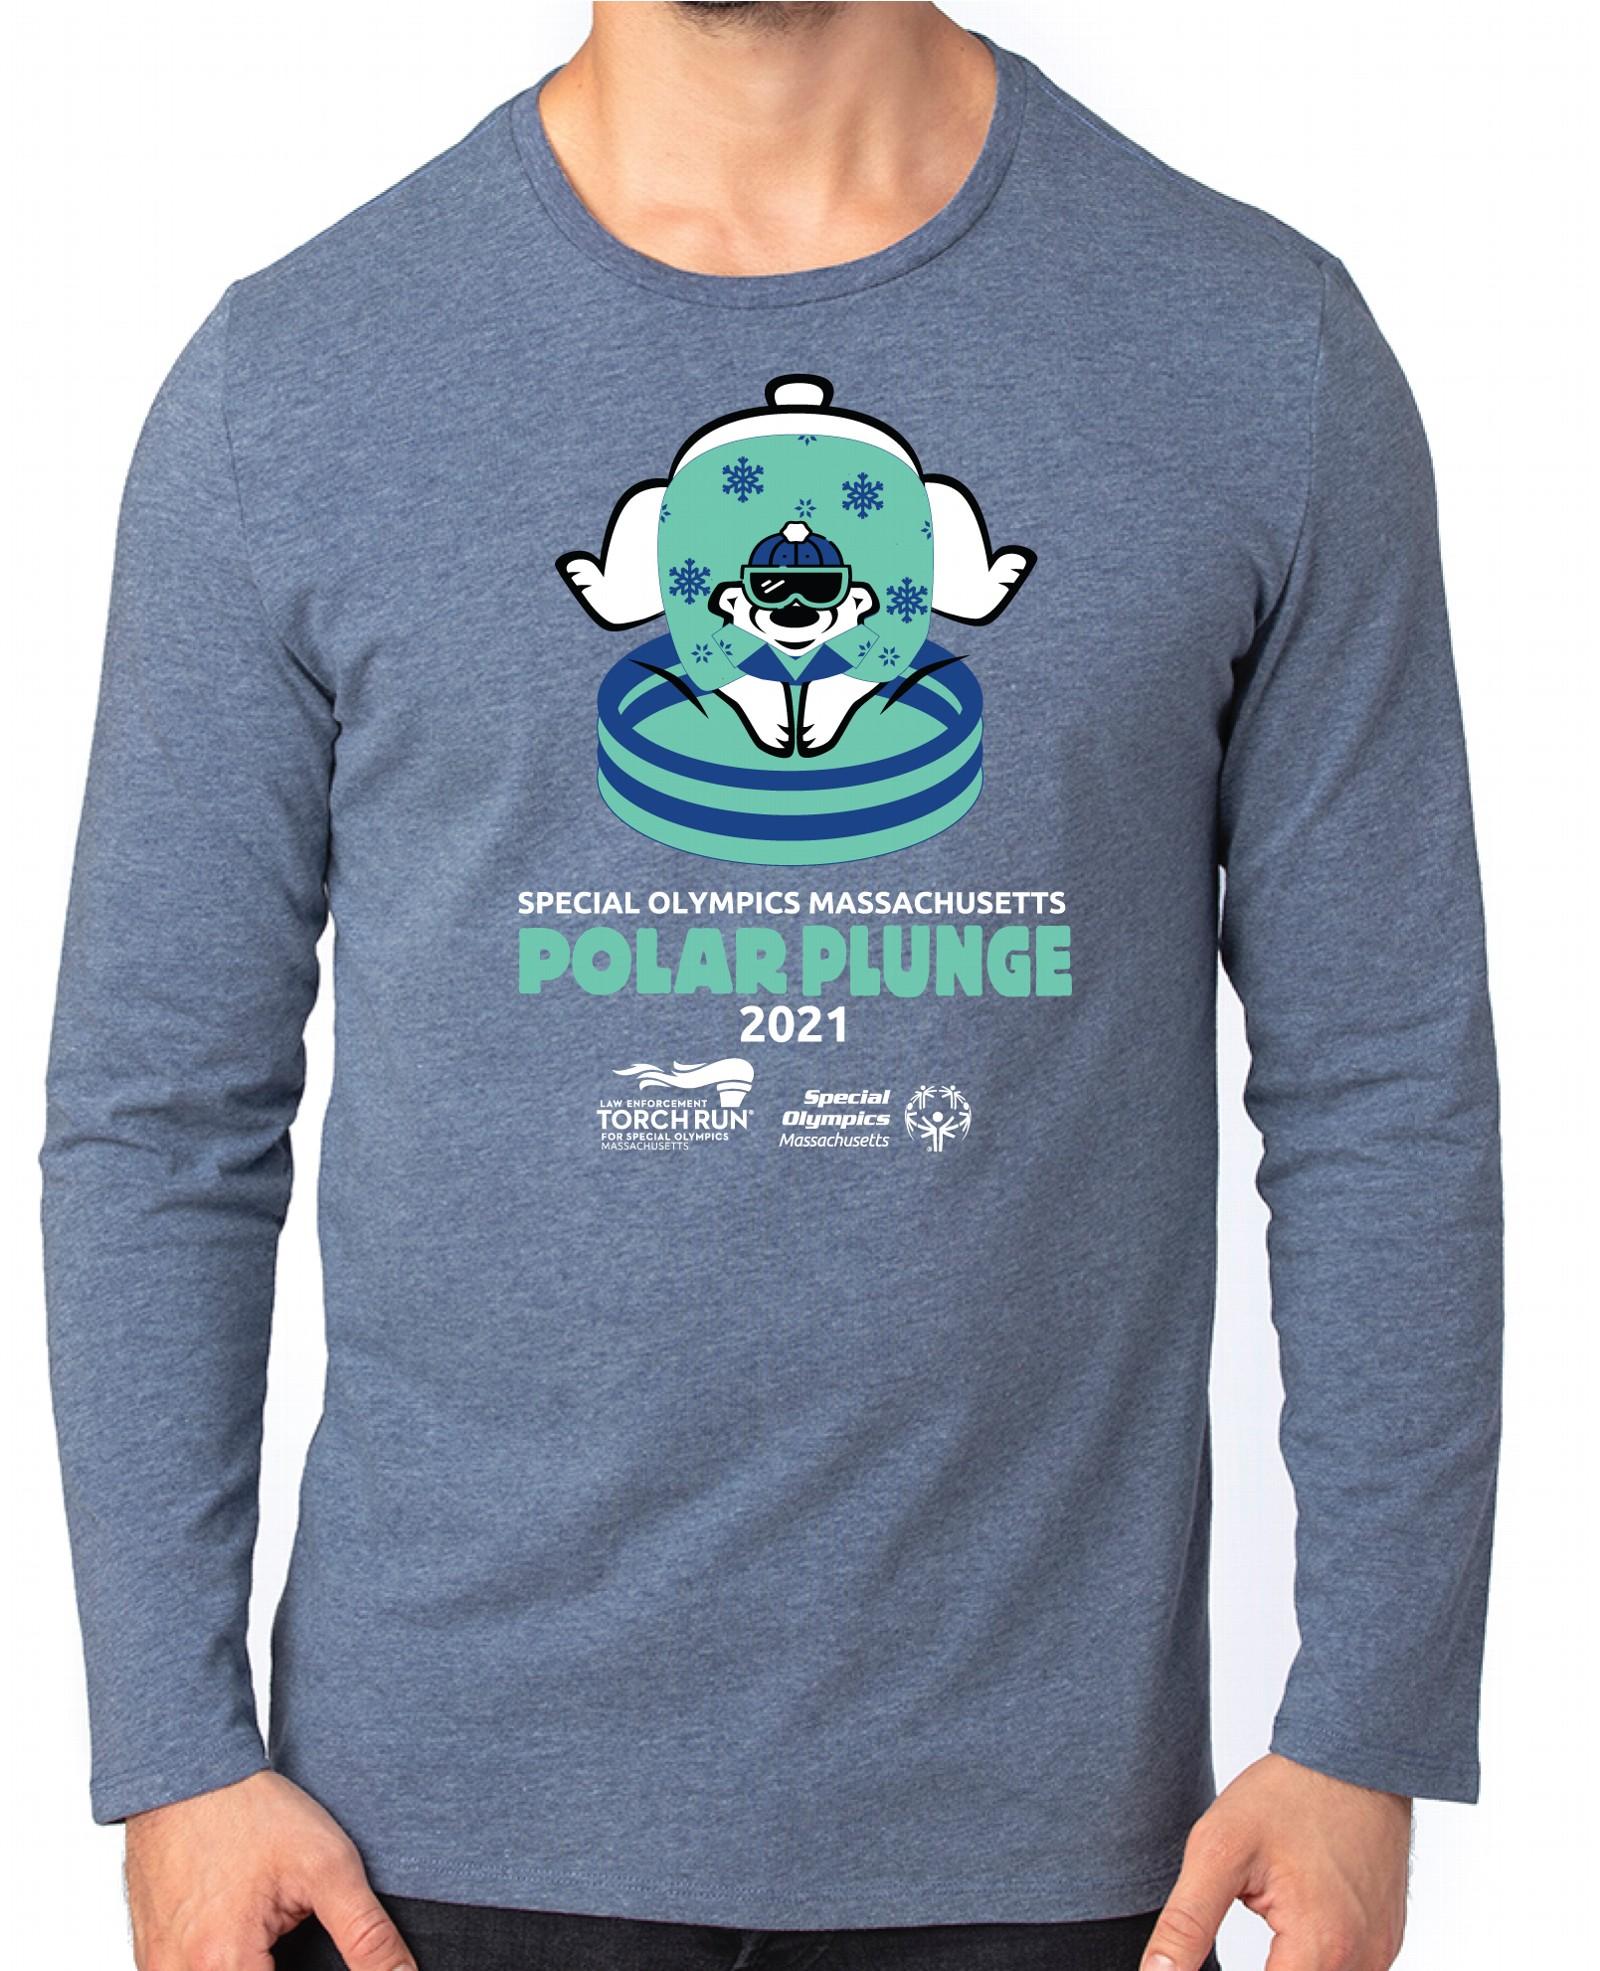 Option 2 Shirt Image - Polar Bear diving into a kiddie pool.